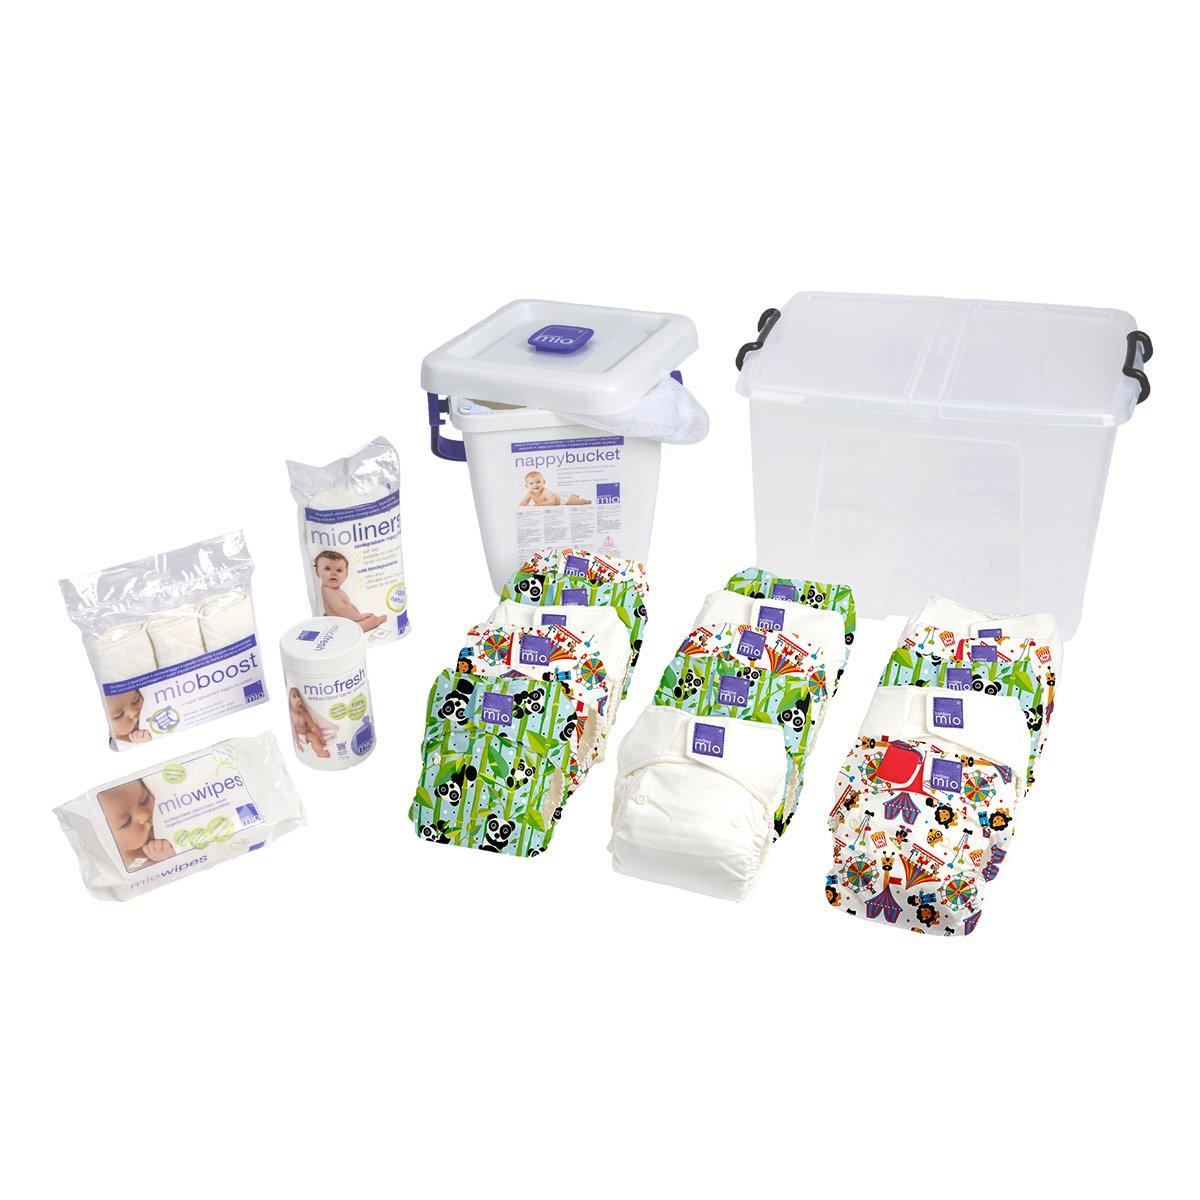 Bambino Mio, Miosolo Cloth Diaper Premium Birth to Potty Pack, OneSize, Unisex